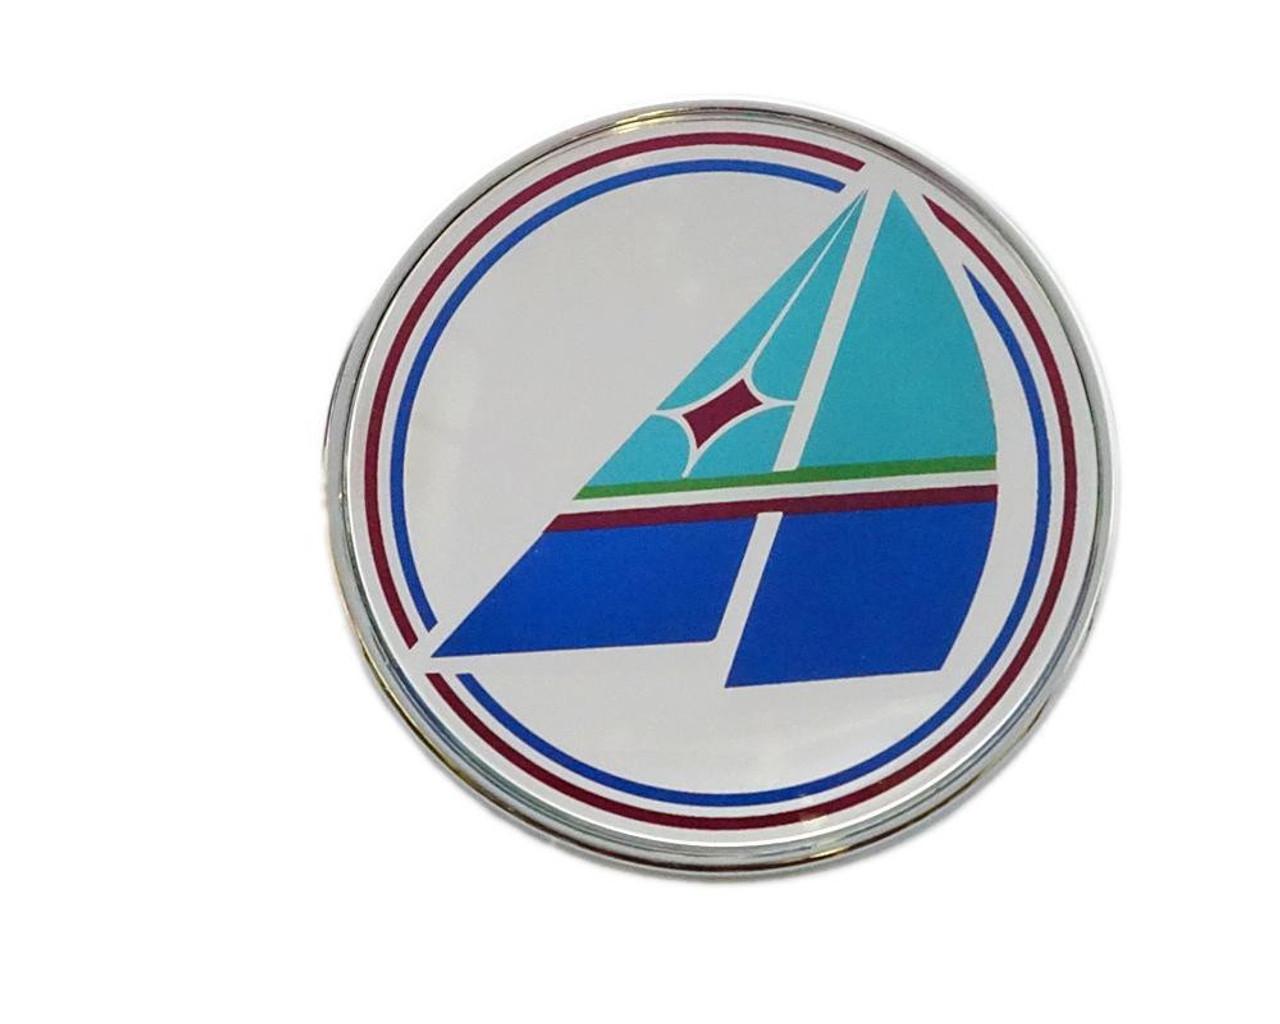 Pininfarina Azzurra Rear Emblem - 1983-85